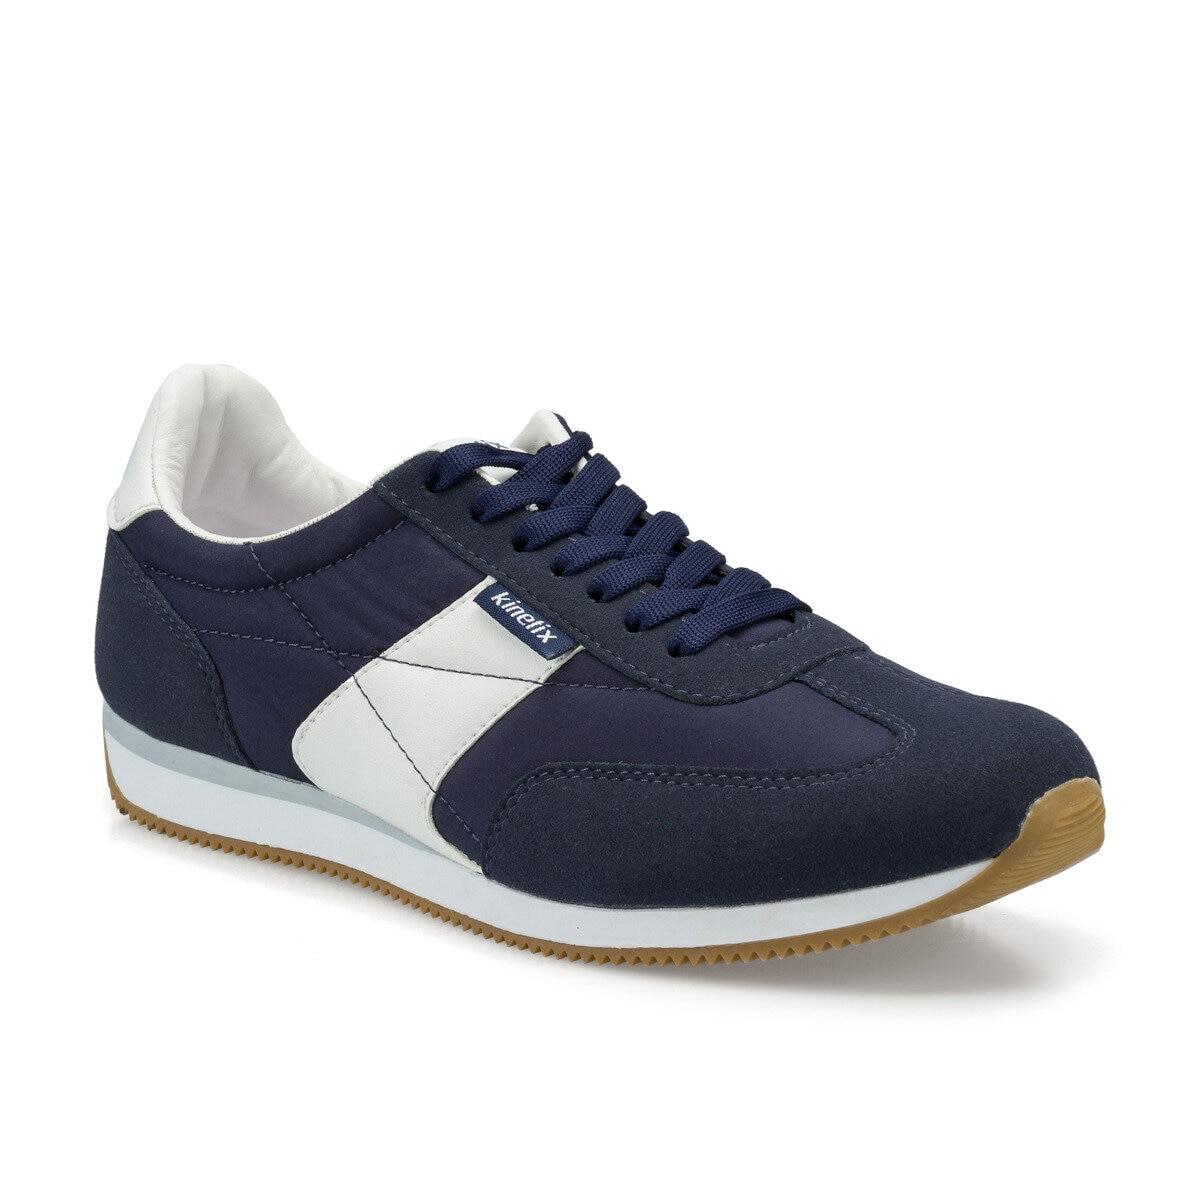 FLO GERSON TEX Navy Blue Men 'S Sneaker Shoes KINETIX